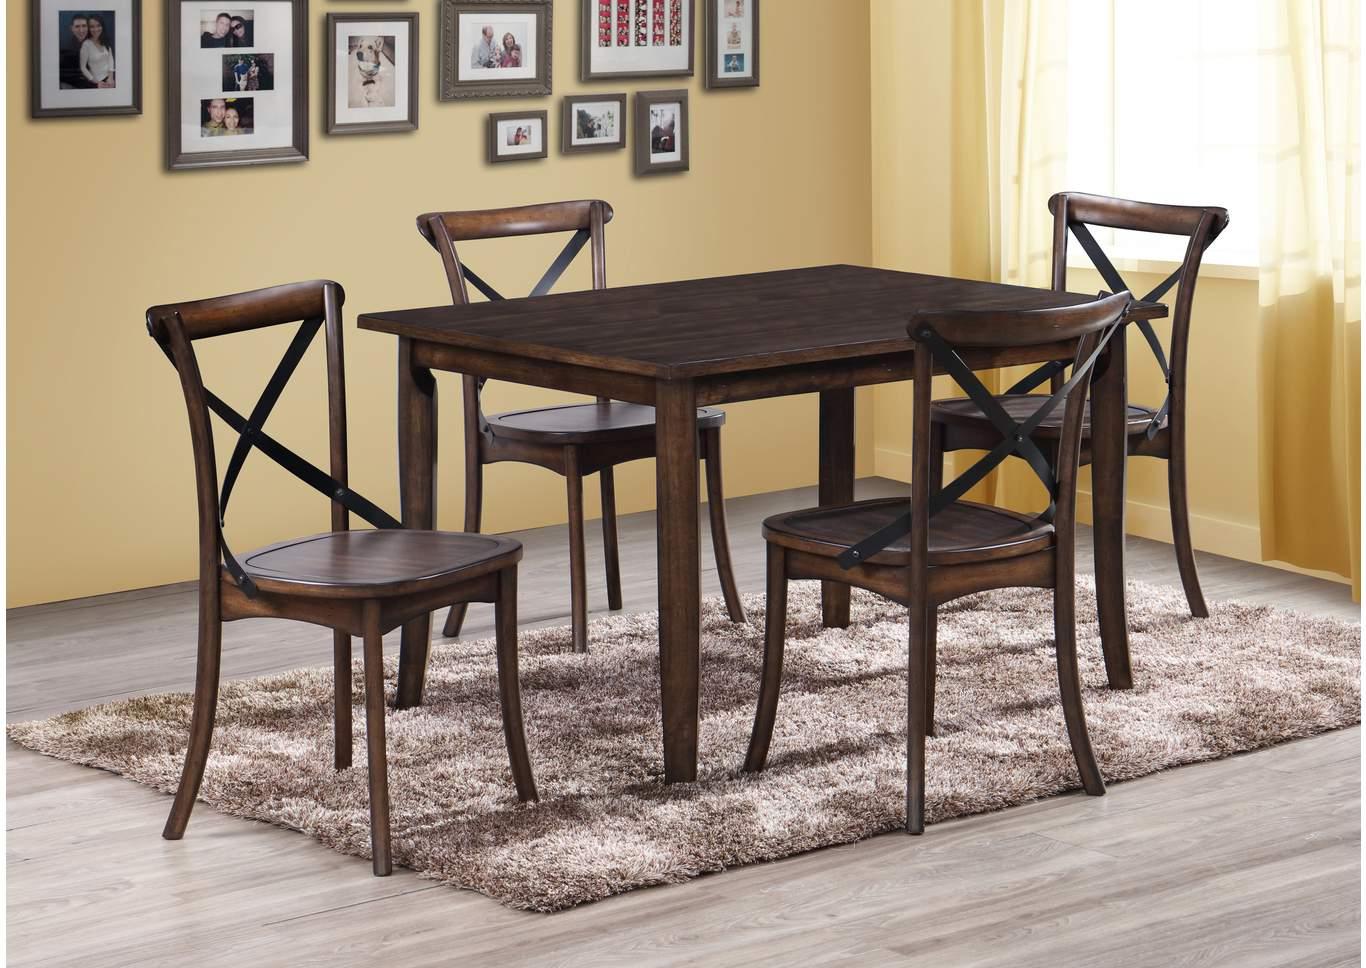 National Furniture Outlet Westwego La Farris Rectangular Dining Table